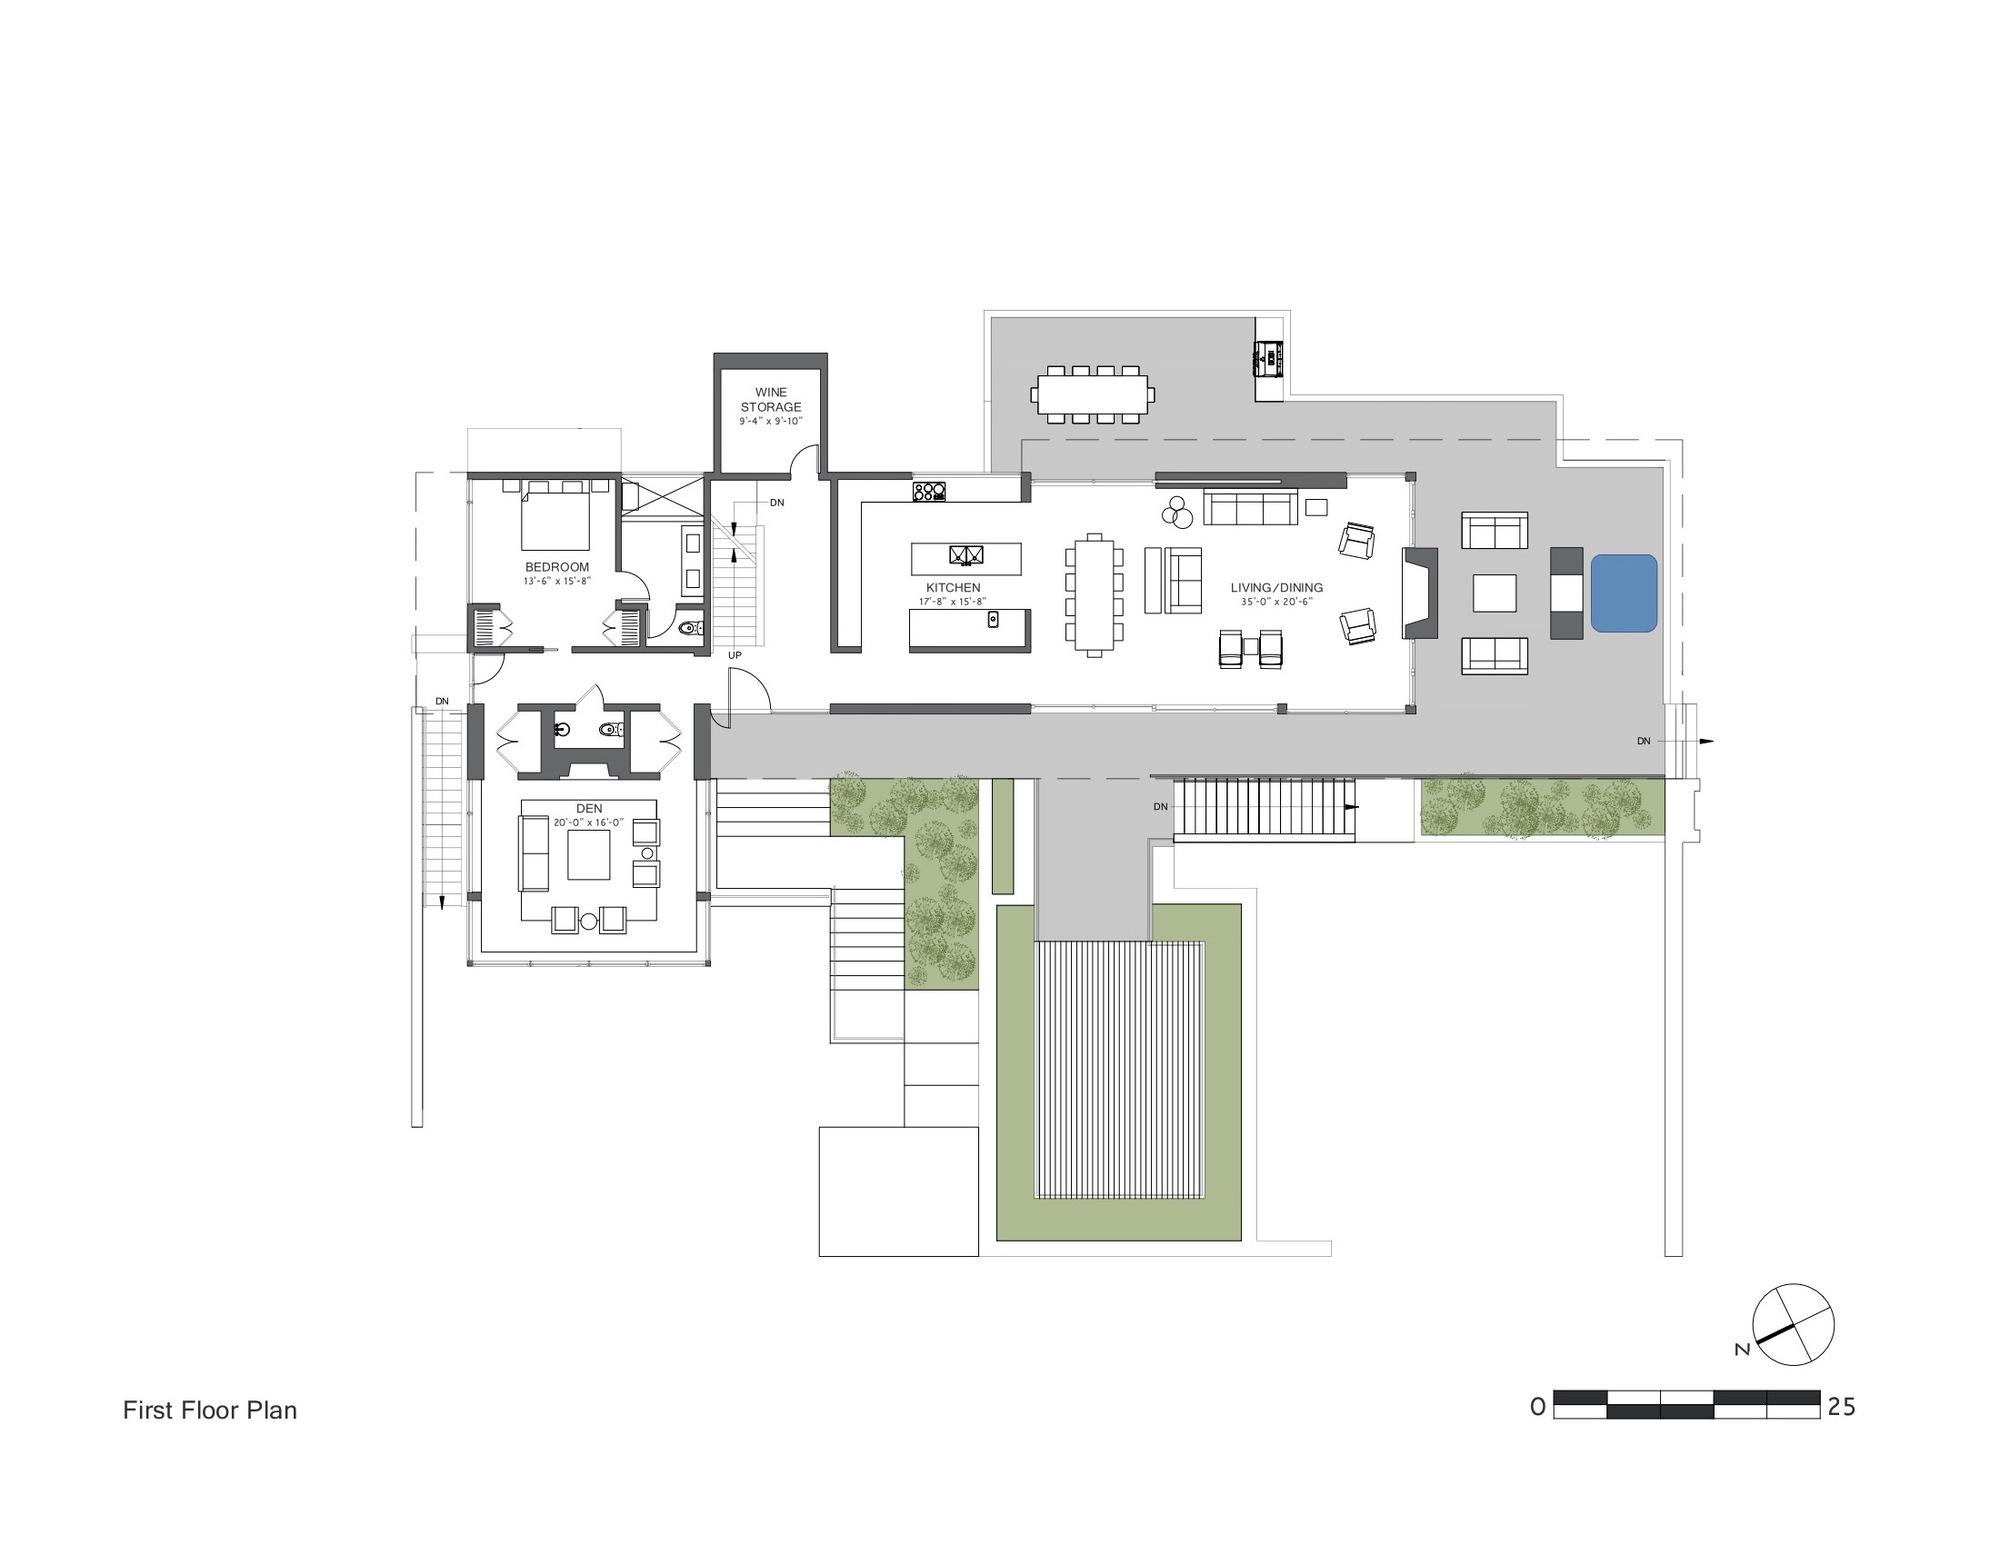 Gallery of Martis Camp 506 / Blaze Makoid Architecture